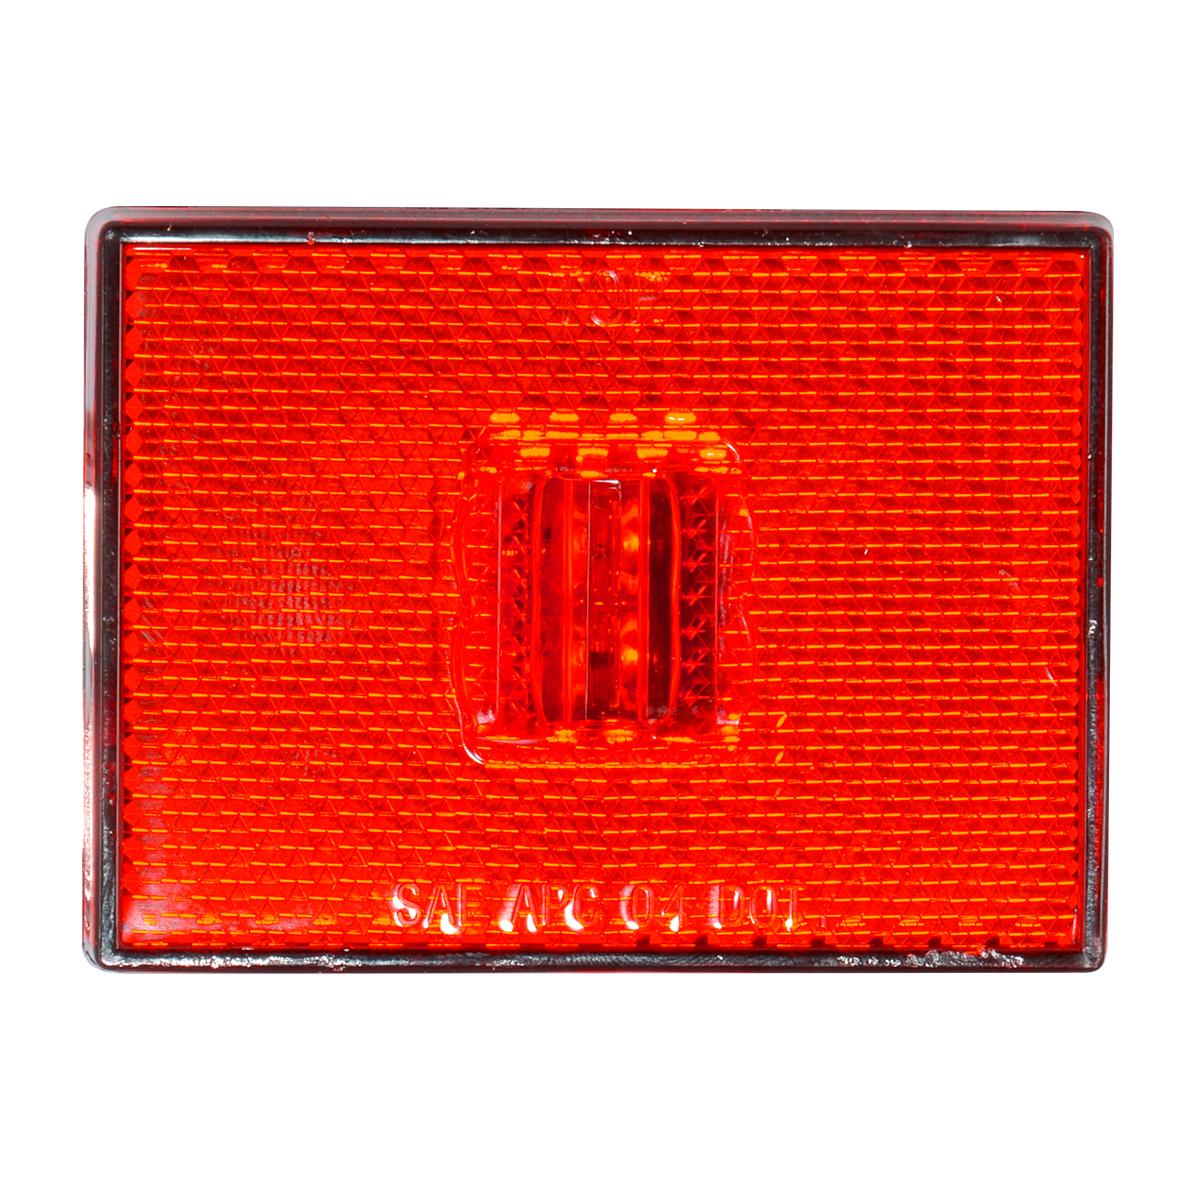 78381 Rectangular Stud Mount LED Light w/ Reflector